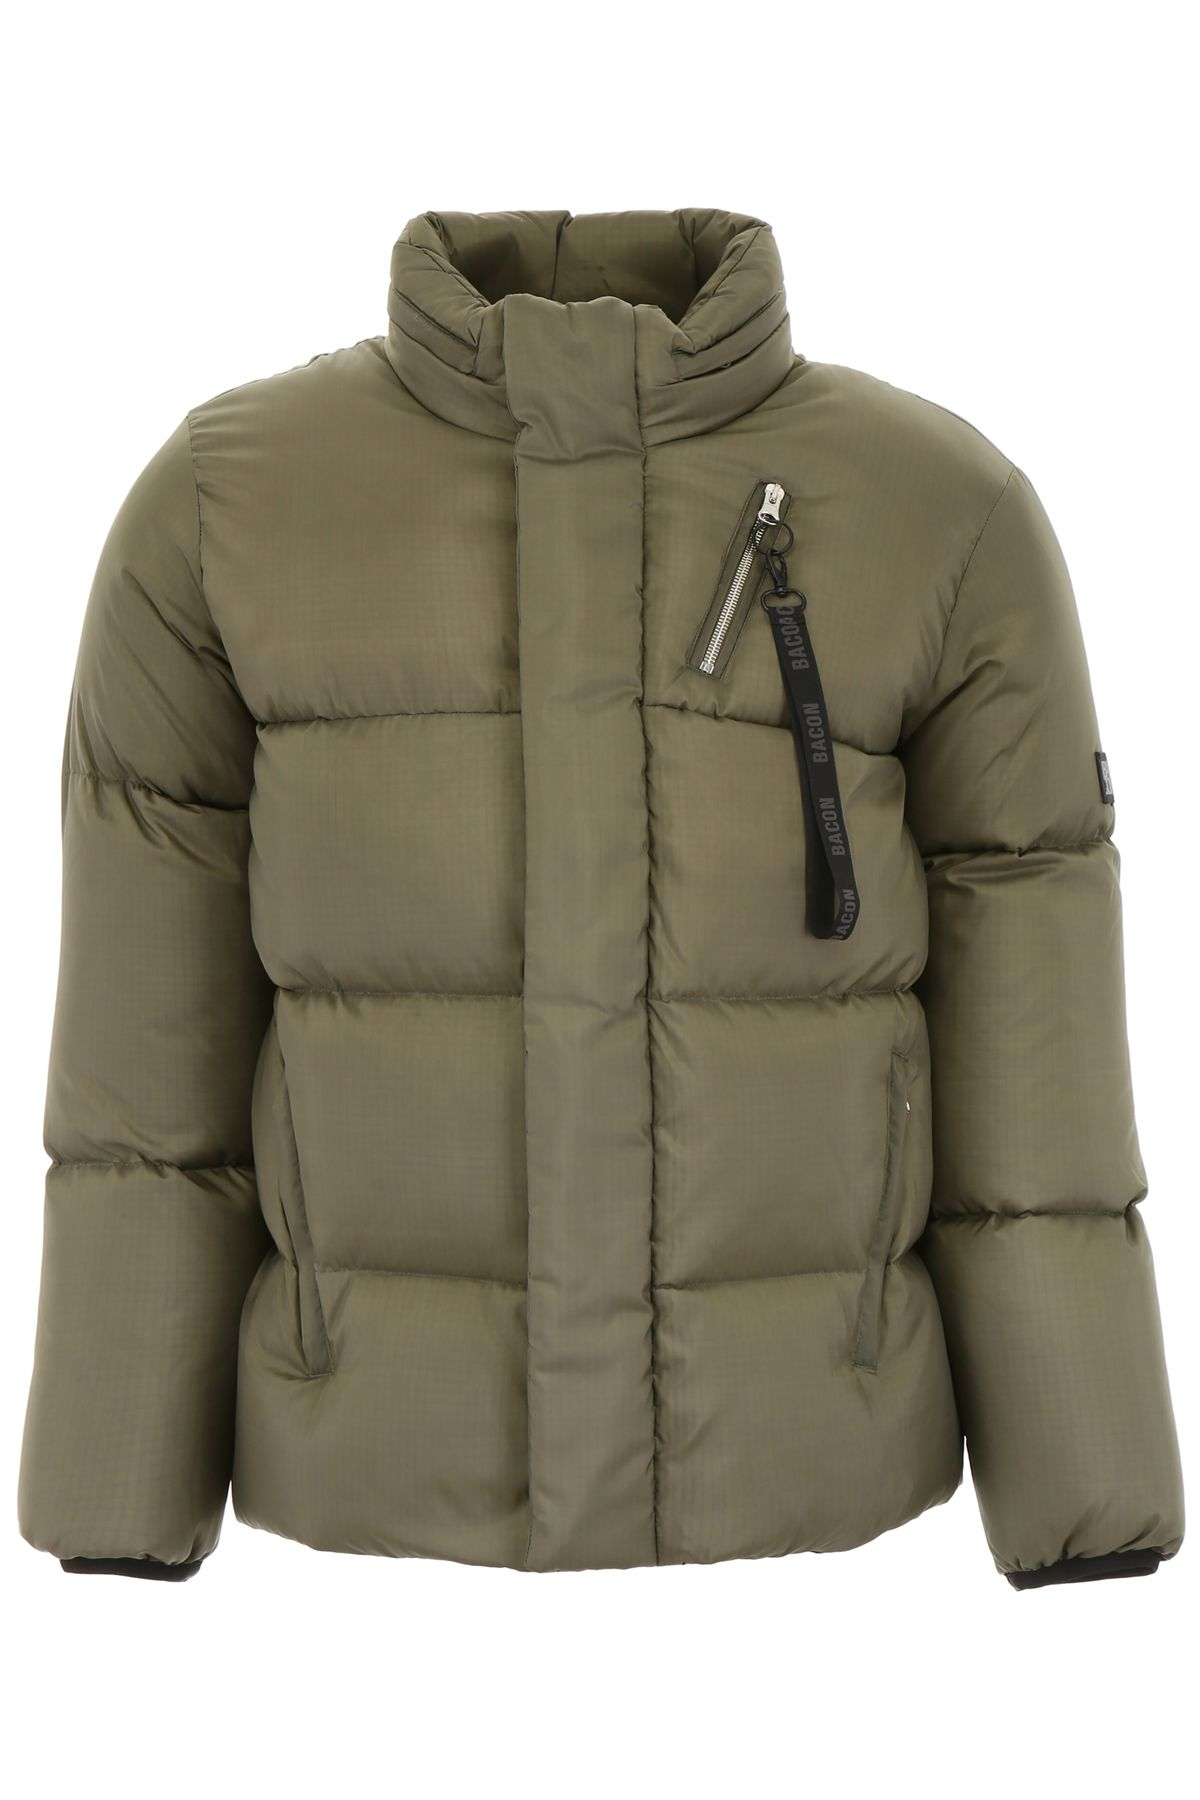 BACON CLOTHING Big Boo Puffer Jacket in Greeen